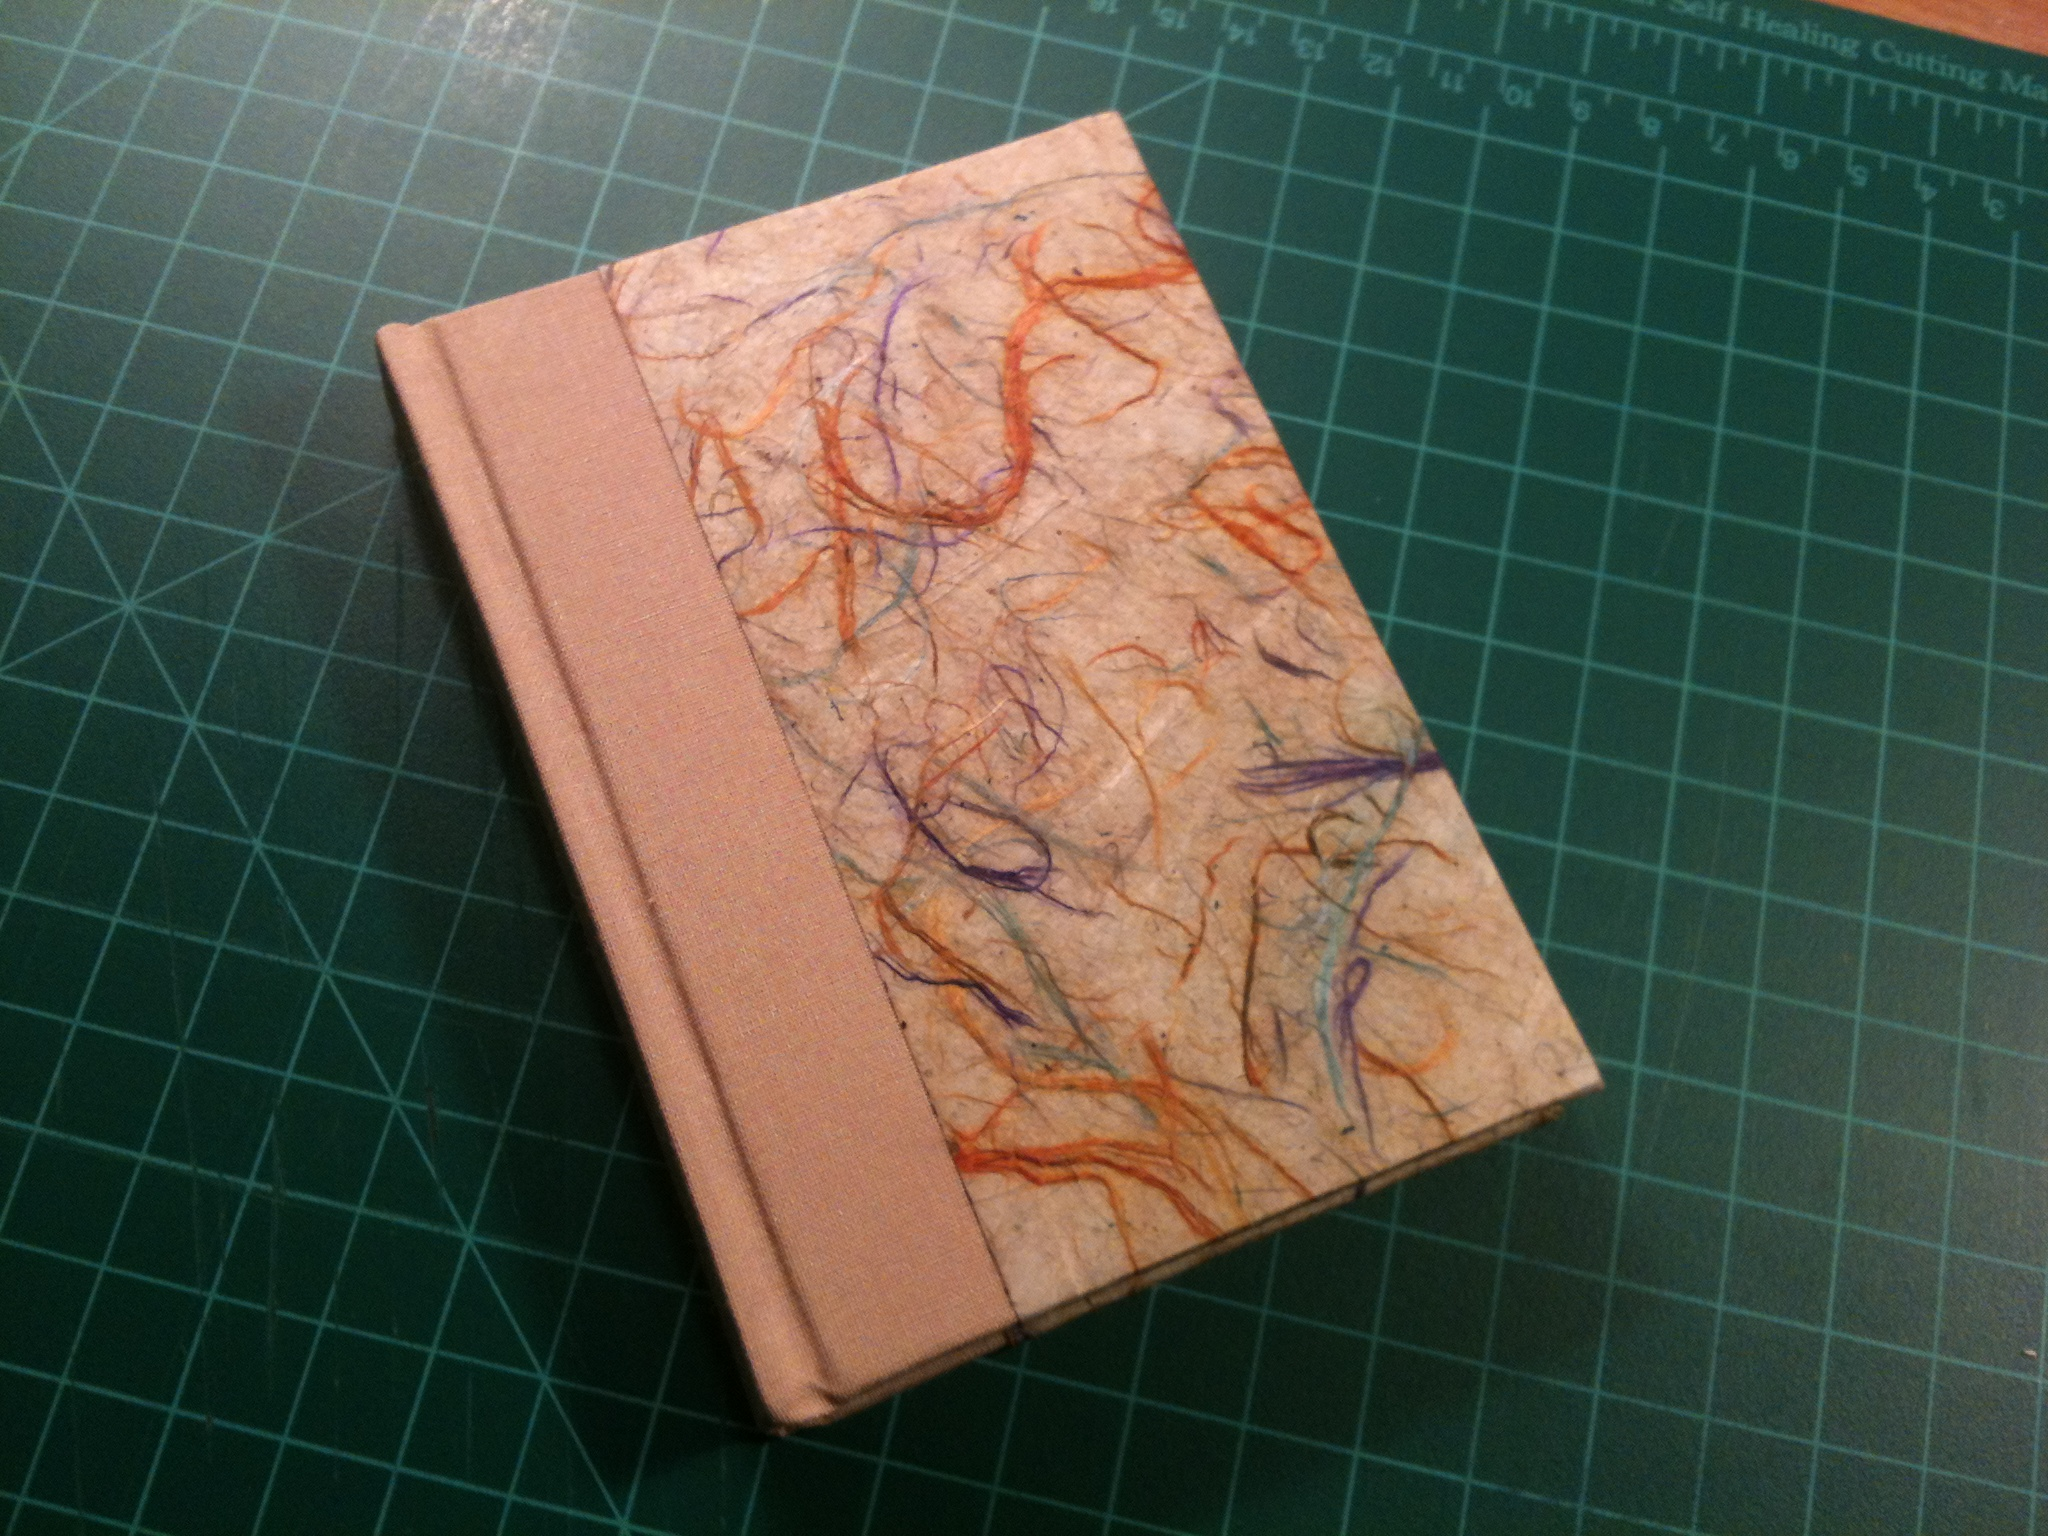 20111207-bookbinding-IMG_0455.JPG